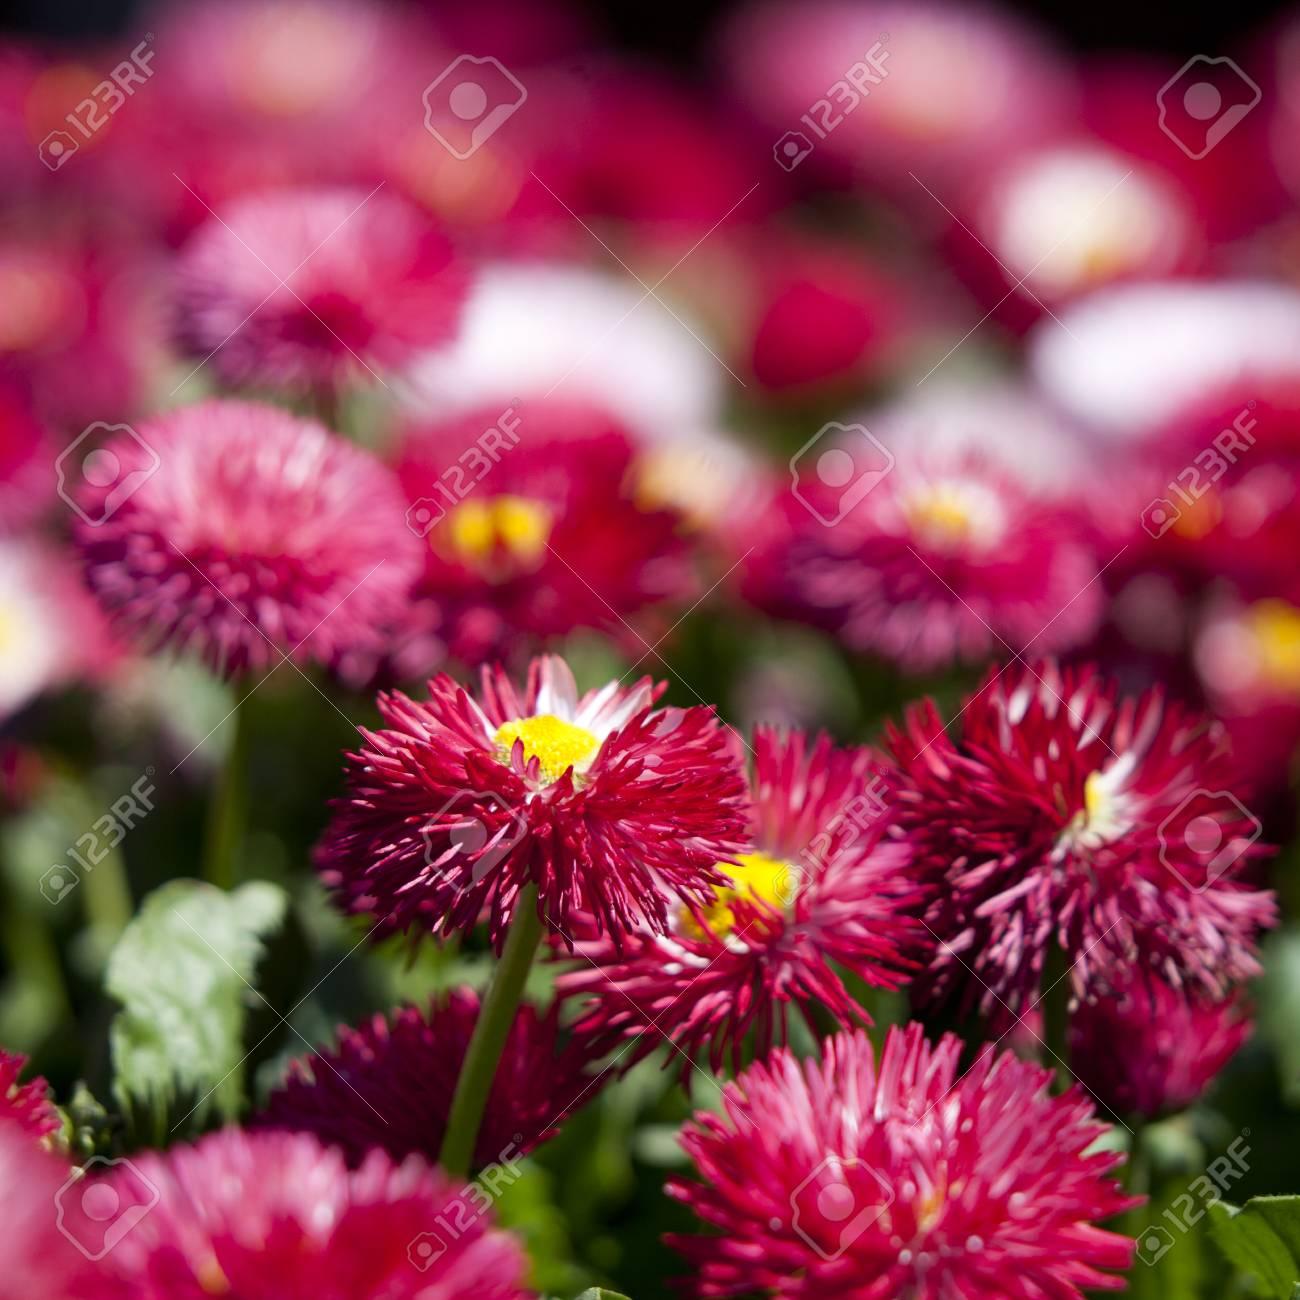 Berühmt Rosa Daisy (Margerite) Blumen Auf Frühling Blumenbeet Lizenzfreie @WD_19